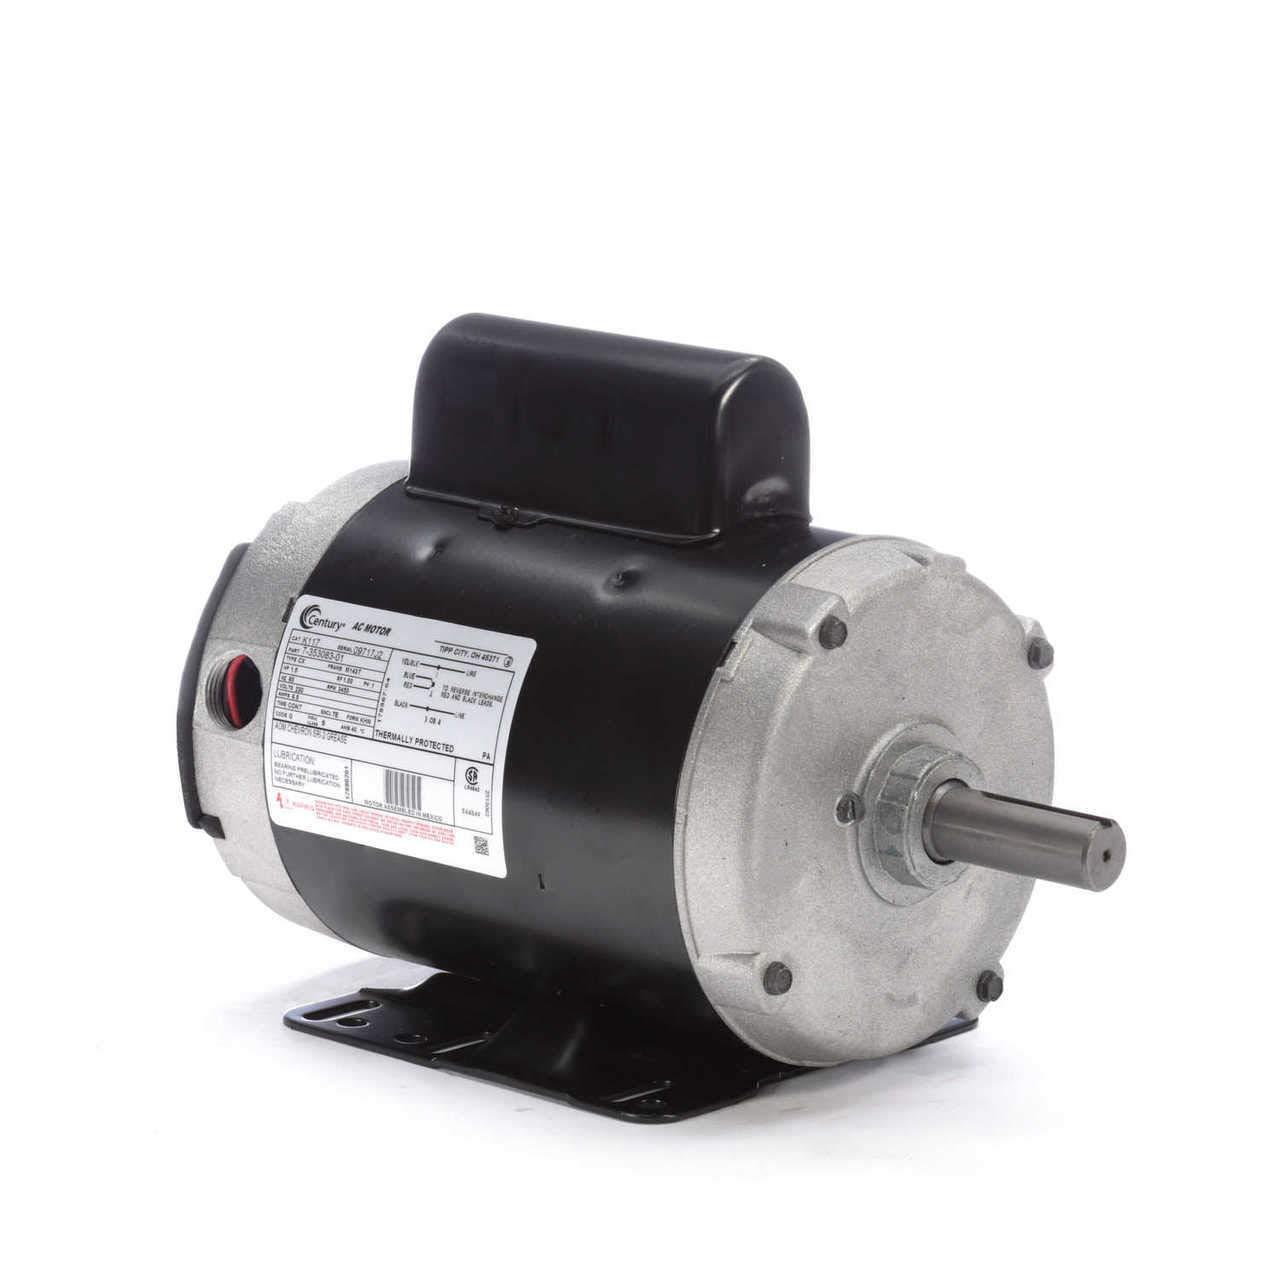 1.5hp 3600RPMAeration Farm Motor 143T Frame 230volts AO Smith/Century Electric Motor # K117